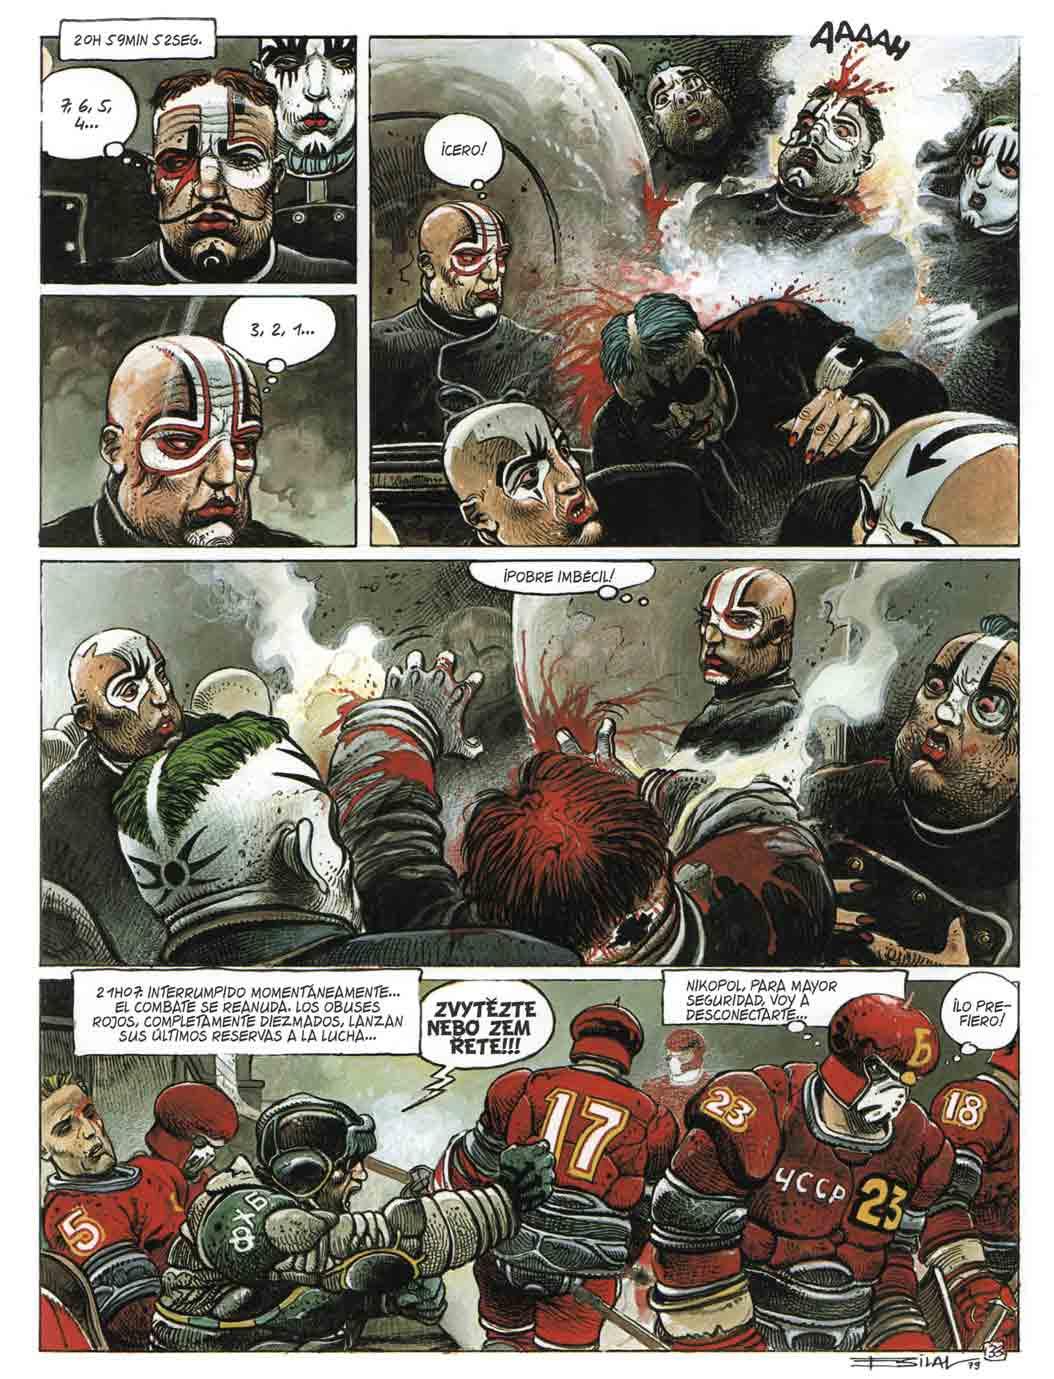 La-trilogia-nikopol-enki-bilal-golem-comics-bd-comic-02